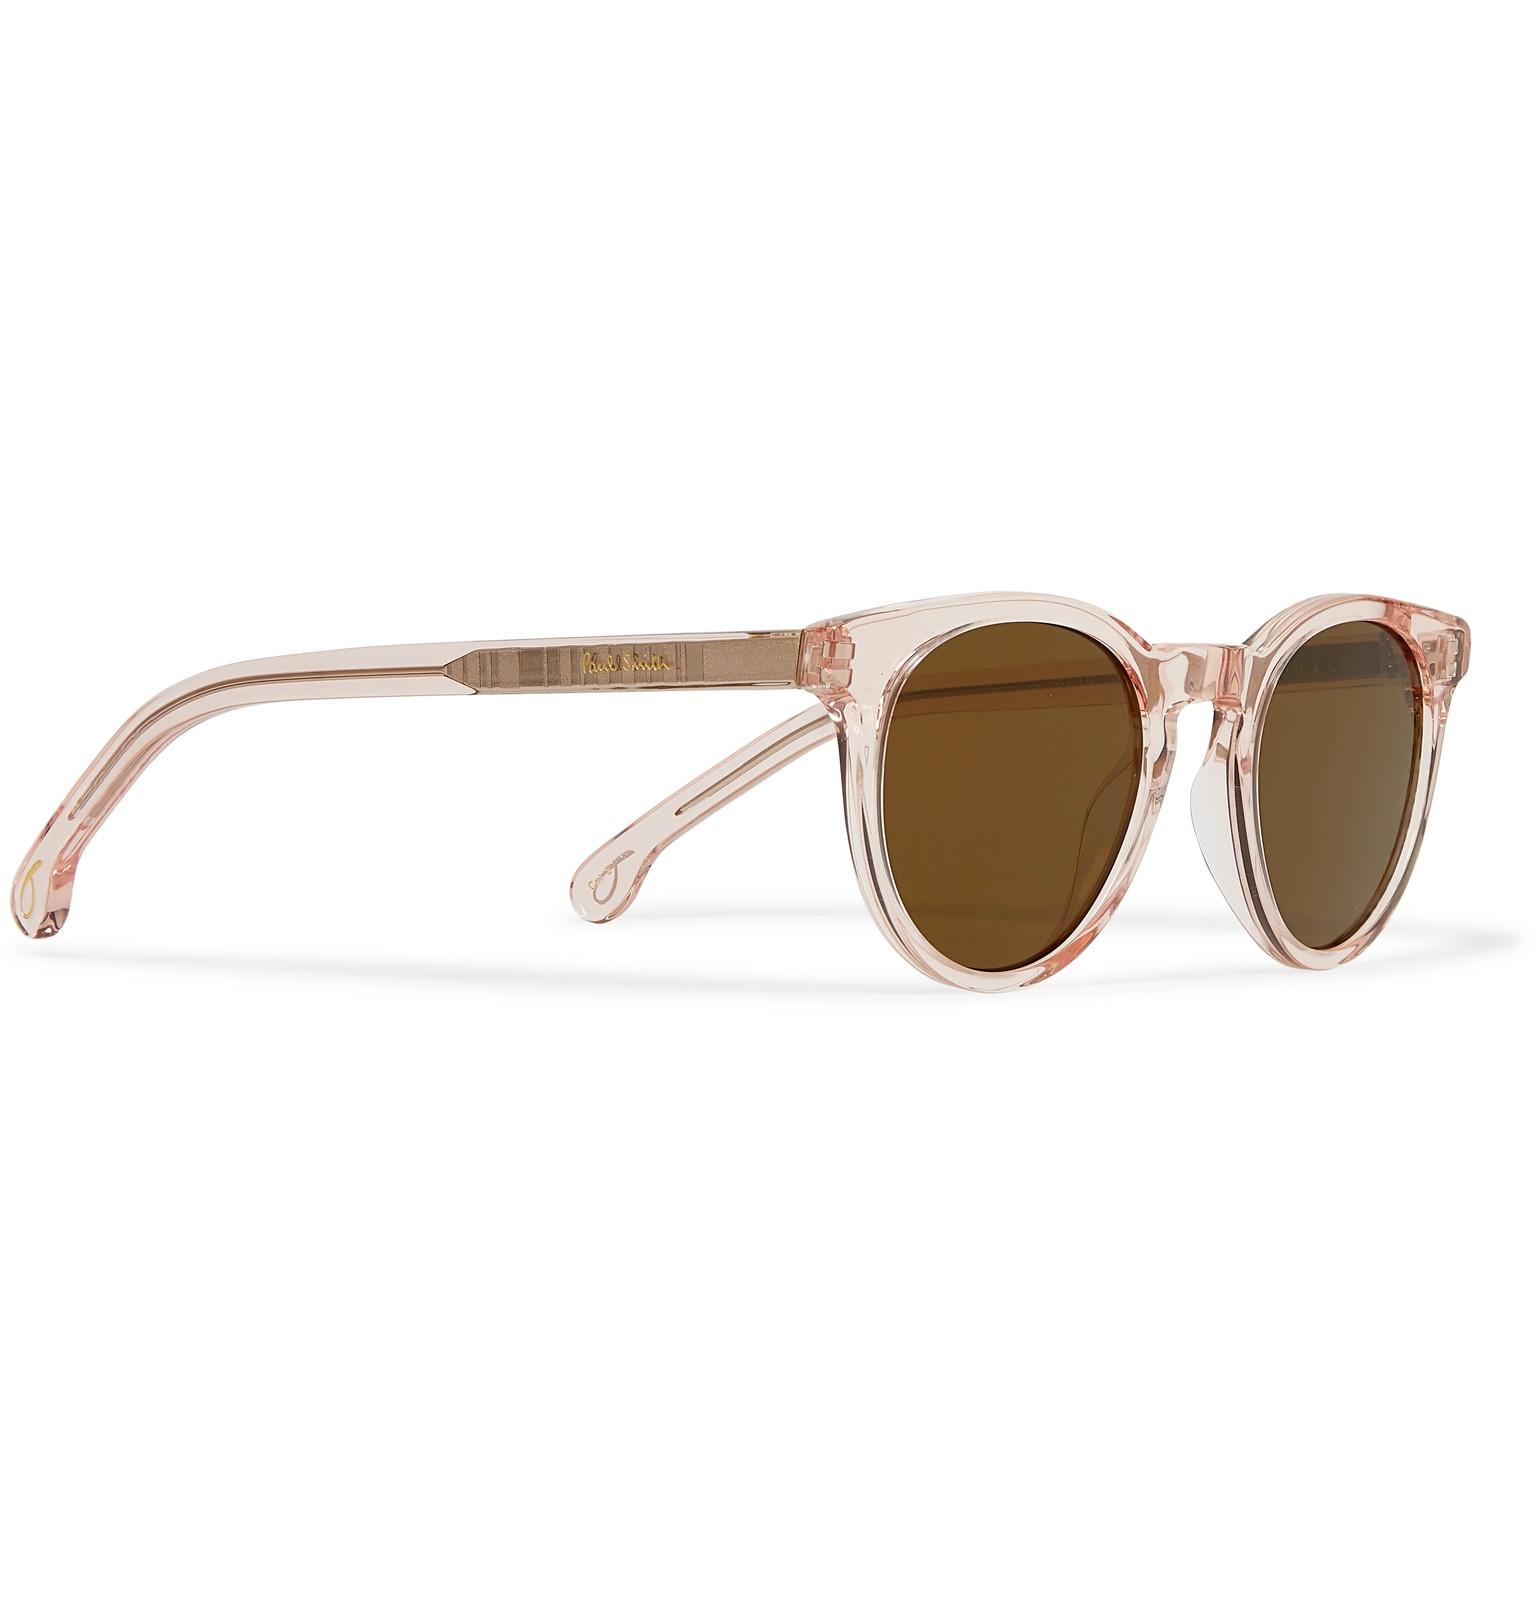 eed9a4b62 Paul Smith - Round-Frame Acetate Sunglasses